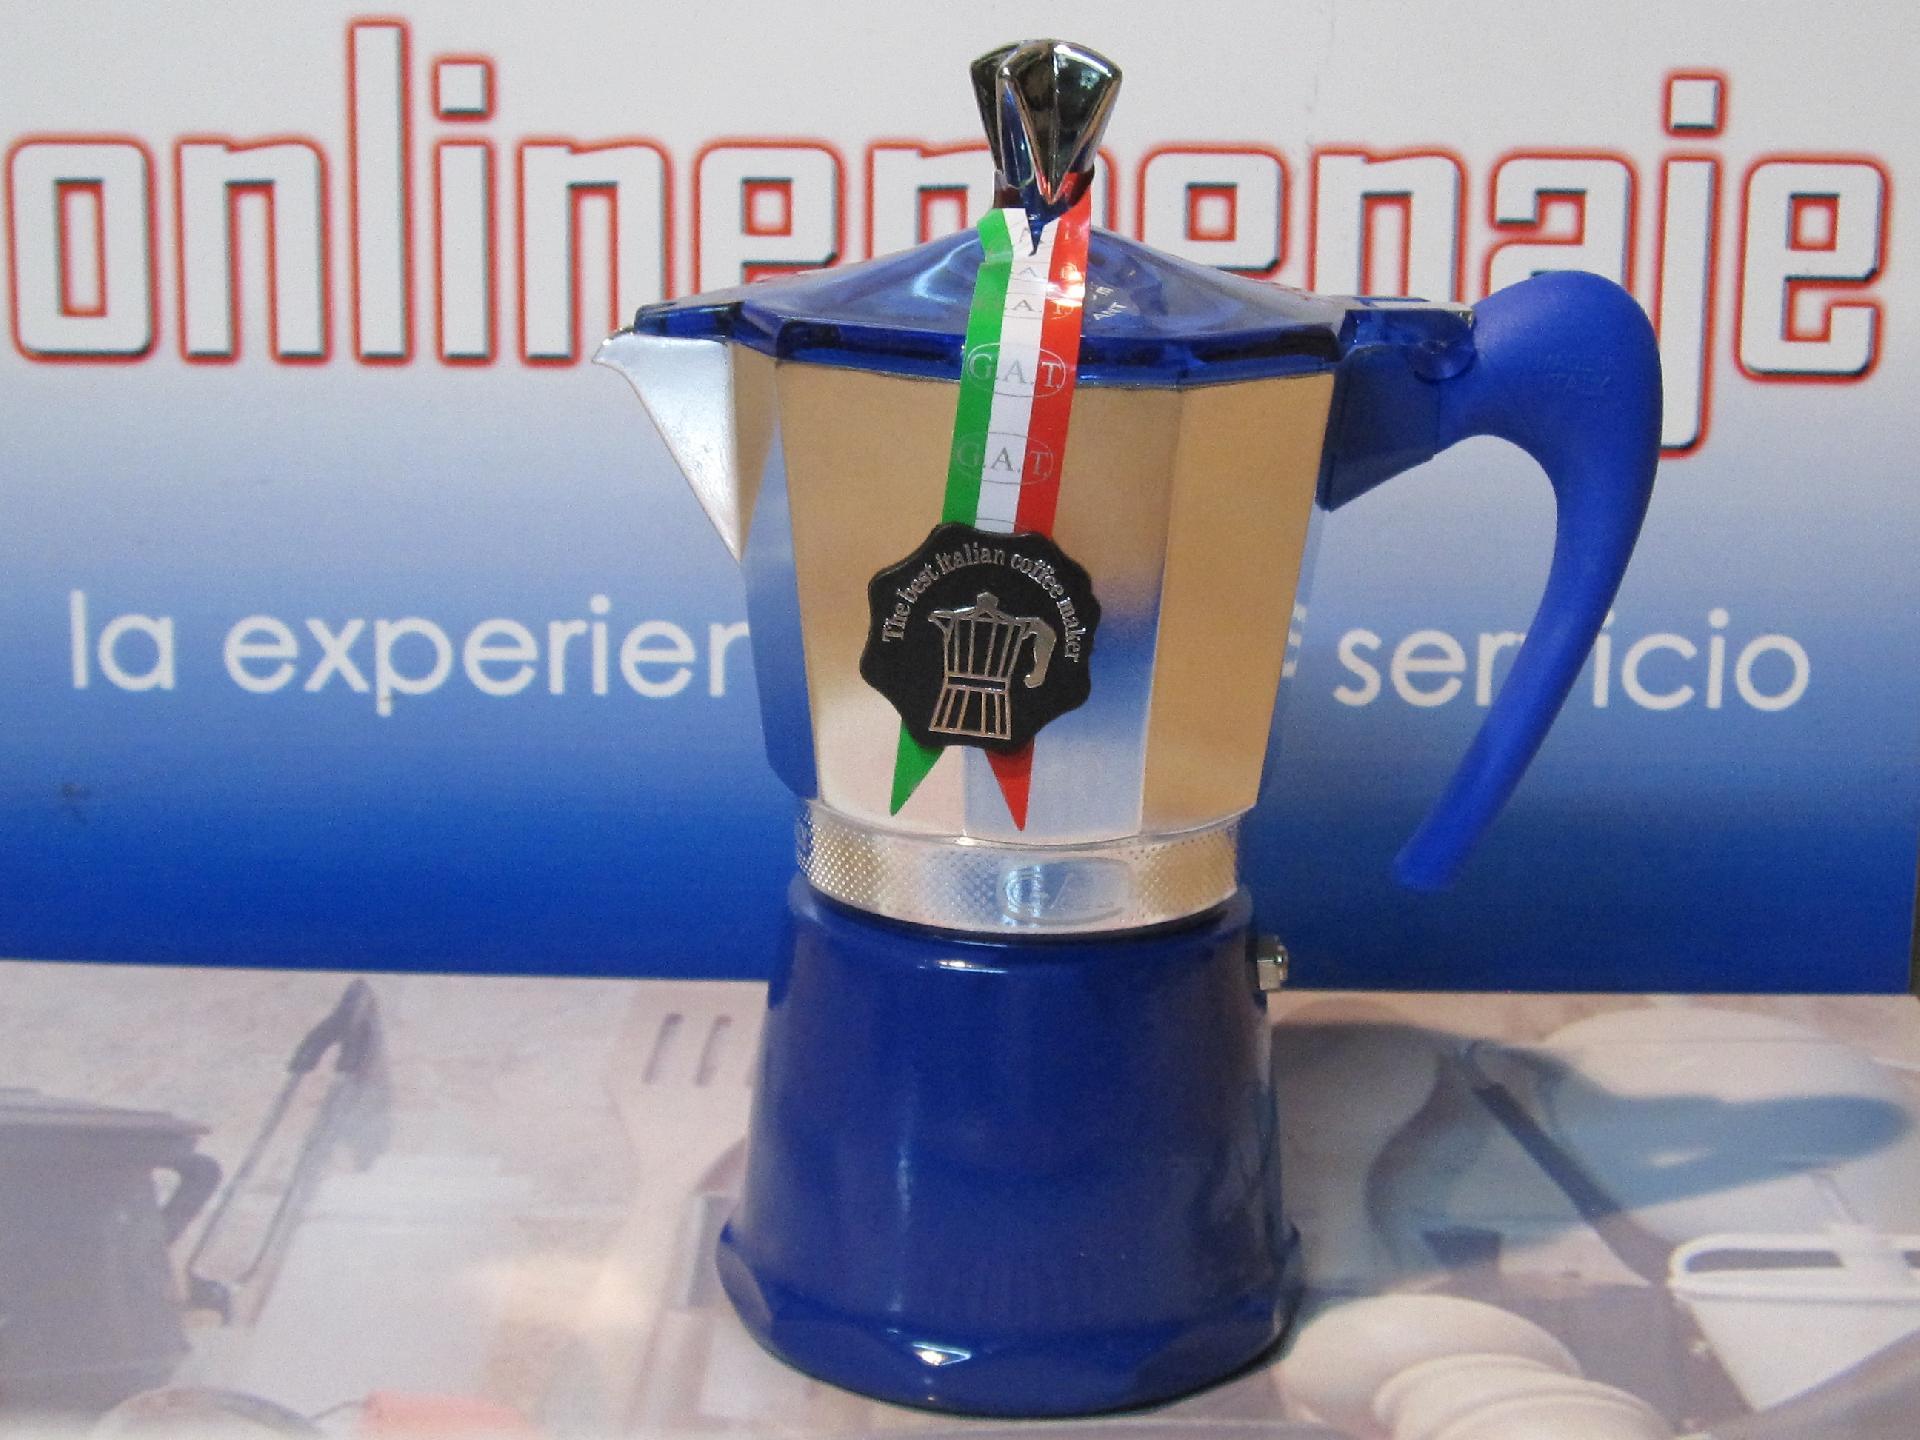 Cafetera induccin Fantasia aluminio azul 9 tazas  Onlinemenaje Tienda virtual  Equipacin de cocina